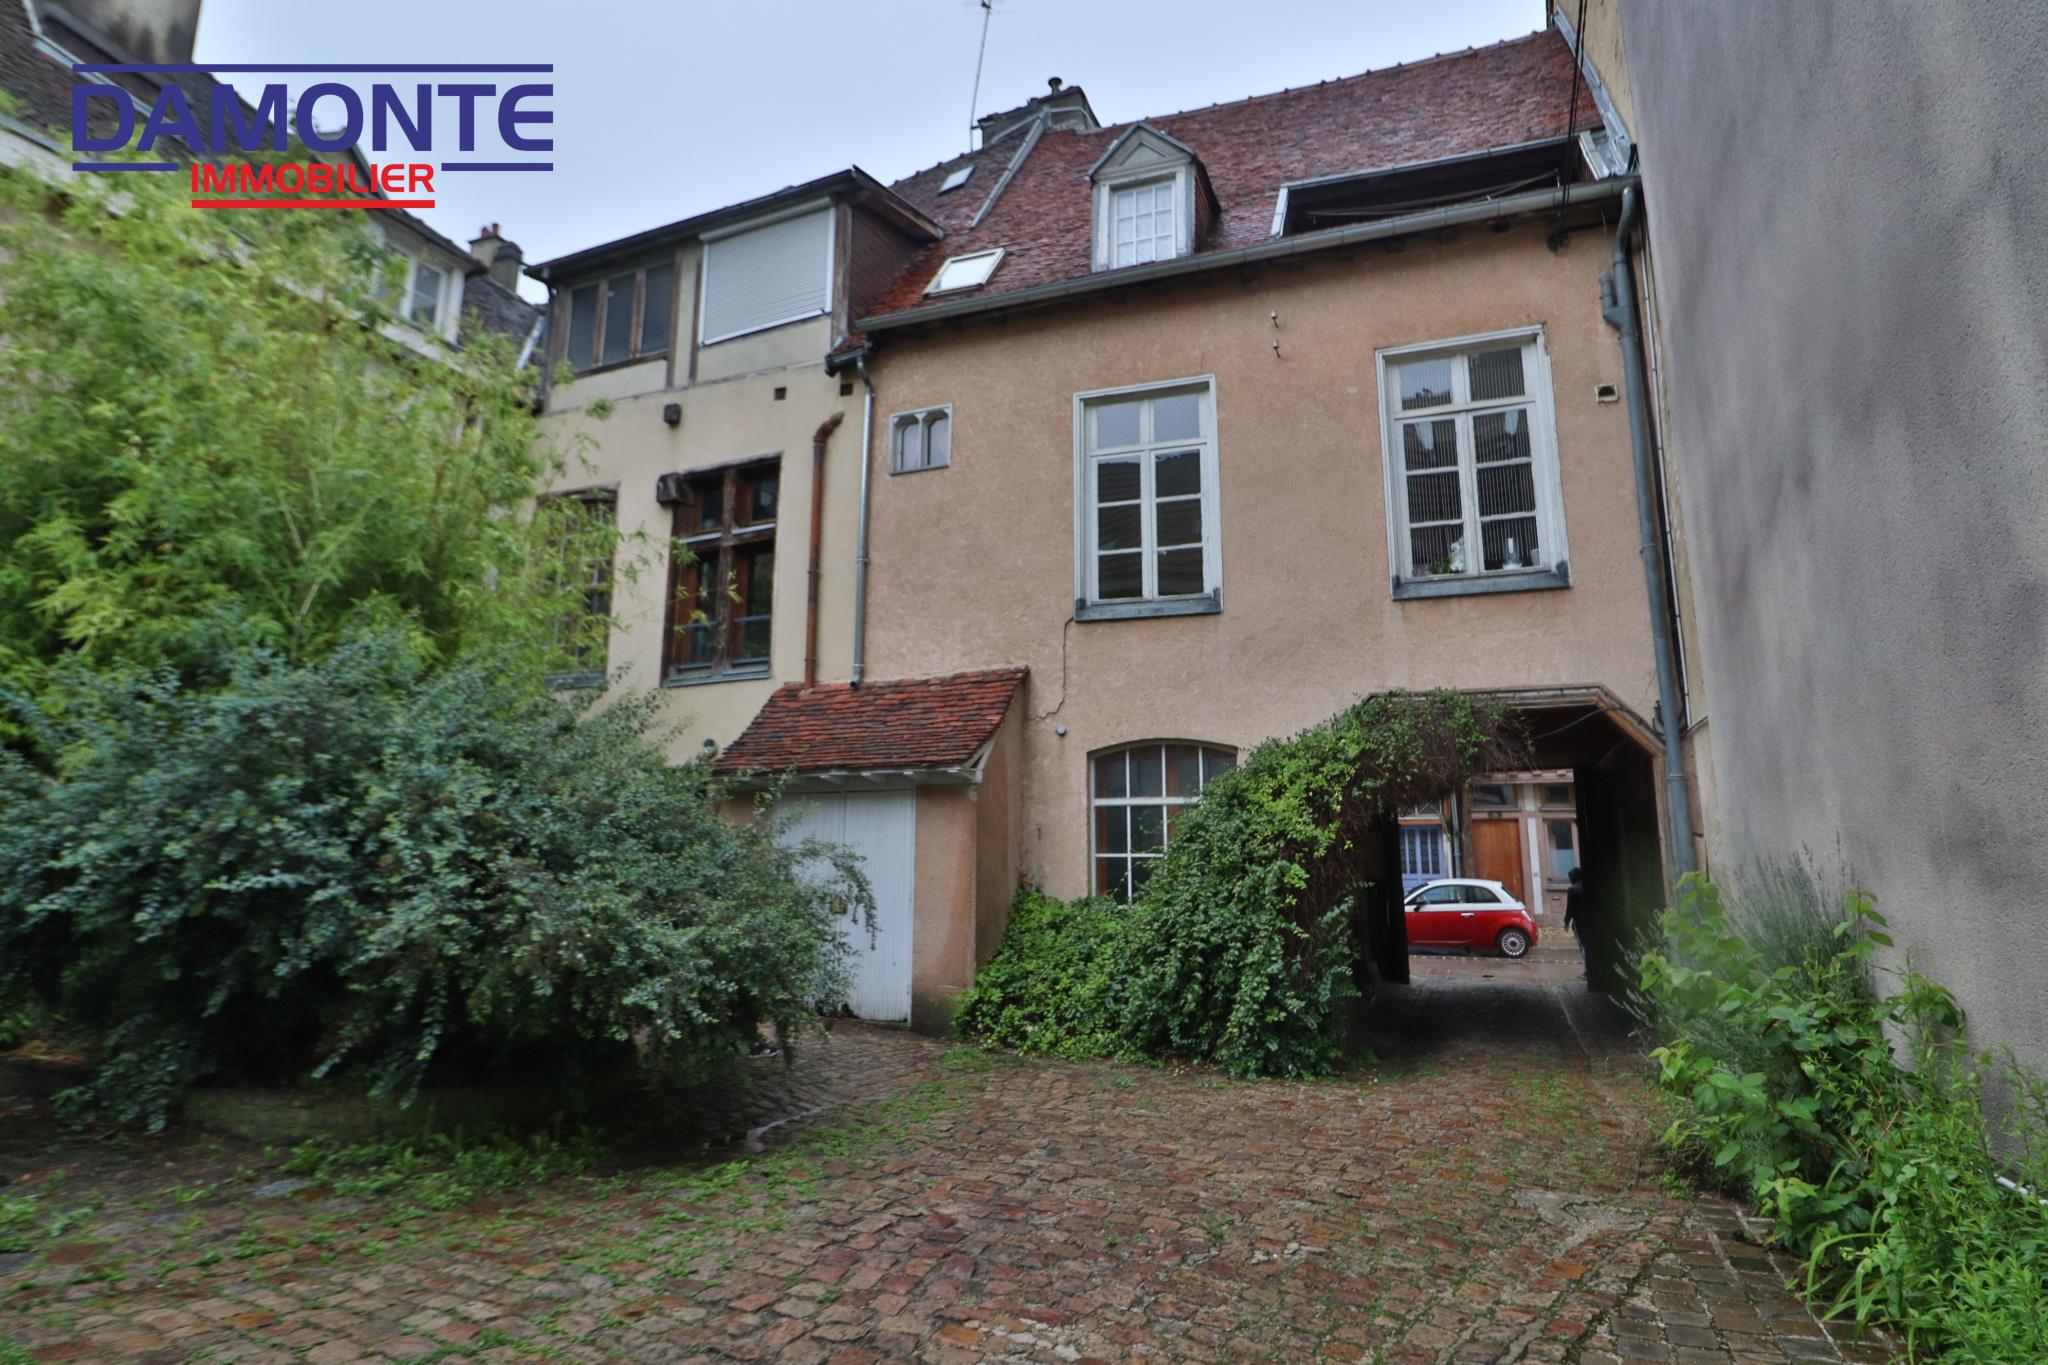 Damonte Achat immeuble - Réf n° 1_19188